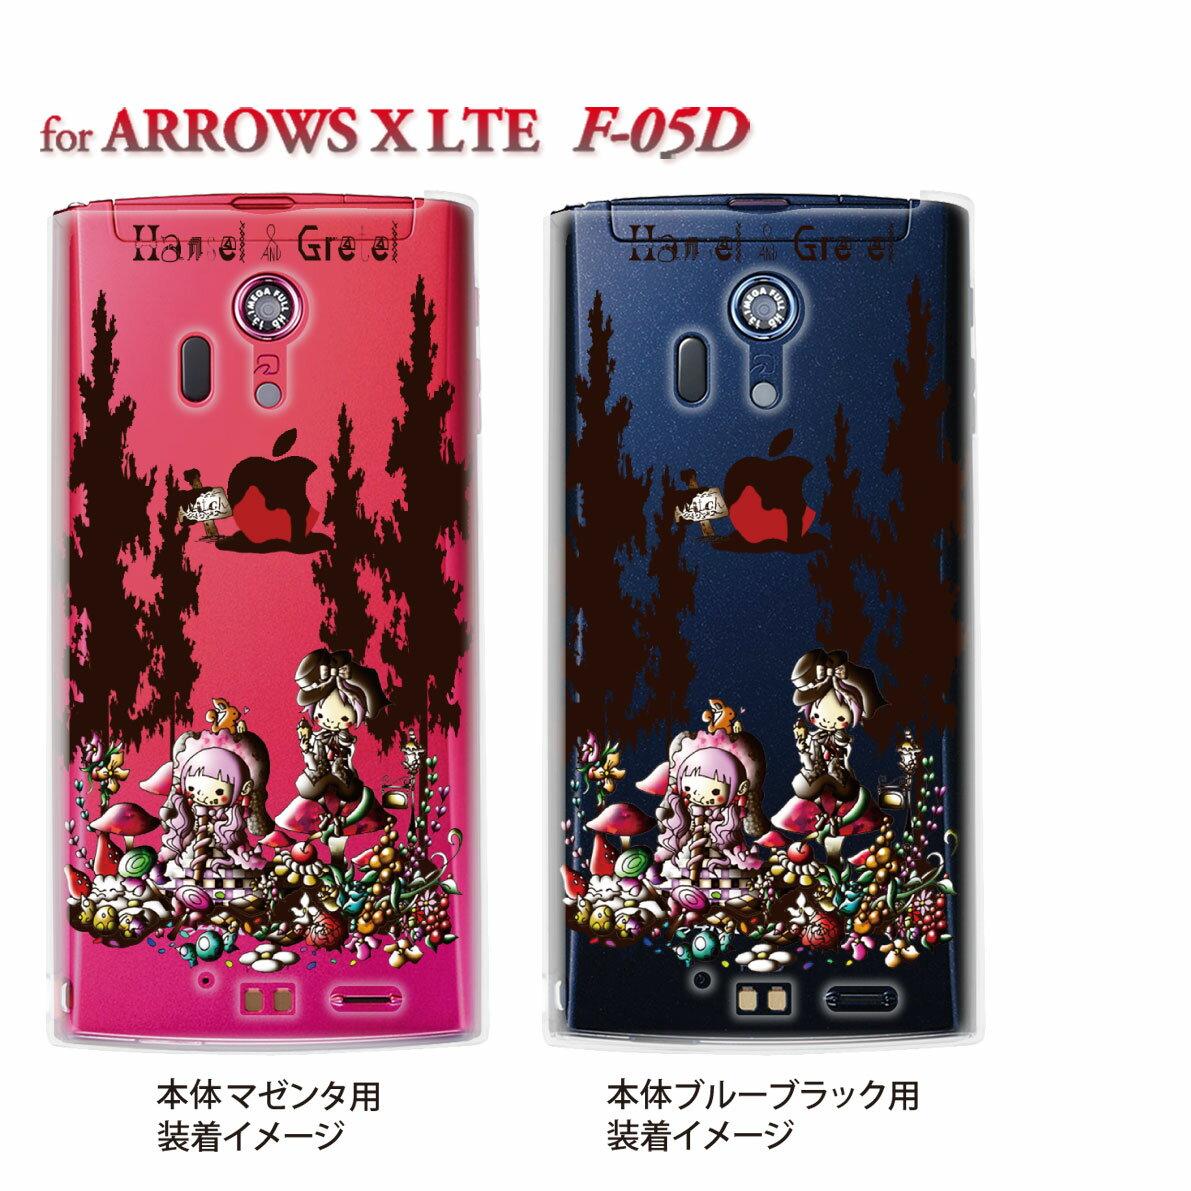 【ARROWS X LTEケース】【F-05D】【docomo】【カバー】【スマホケース】【クリアケース】【アート】【Little World】【ベンゼルとグレーテル】【グリム童話】【お菓子の家】 25-f05d-am0026